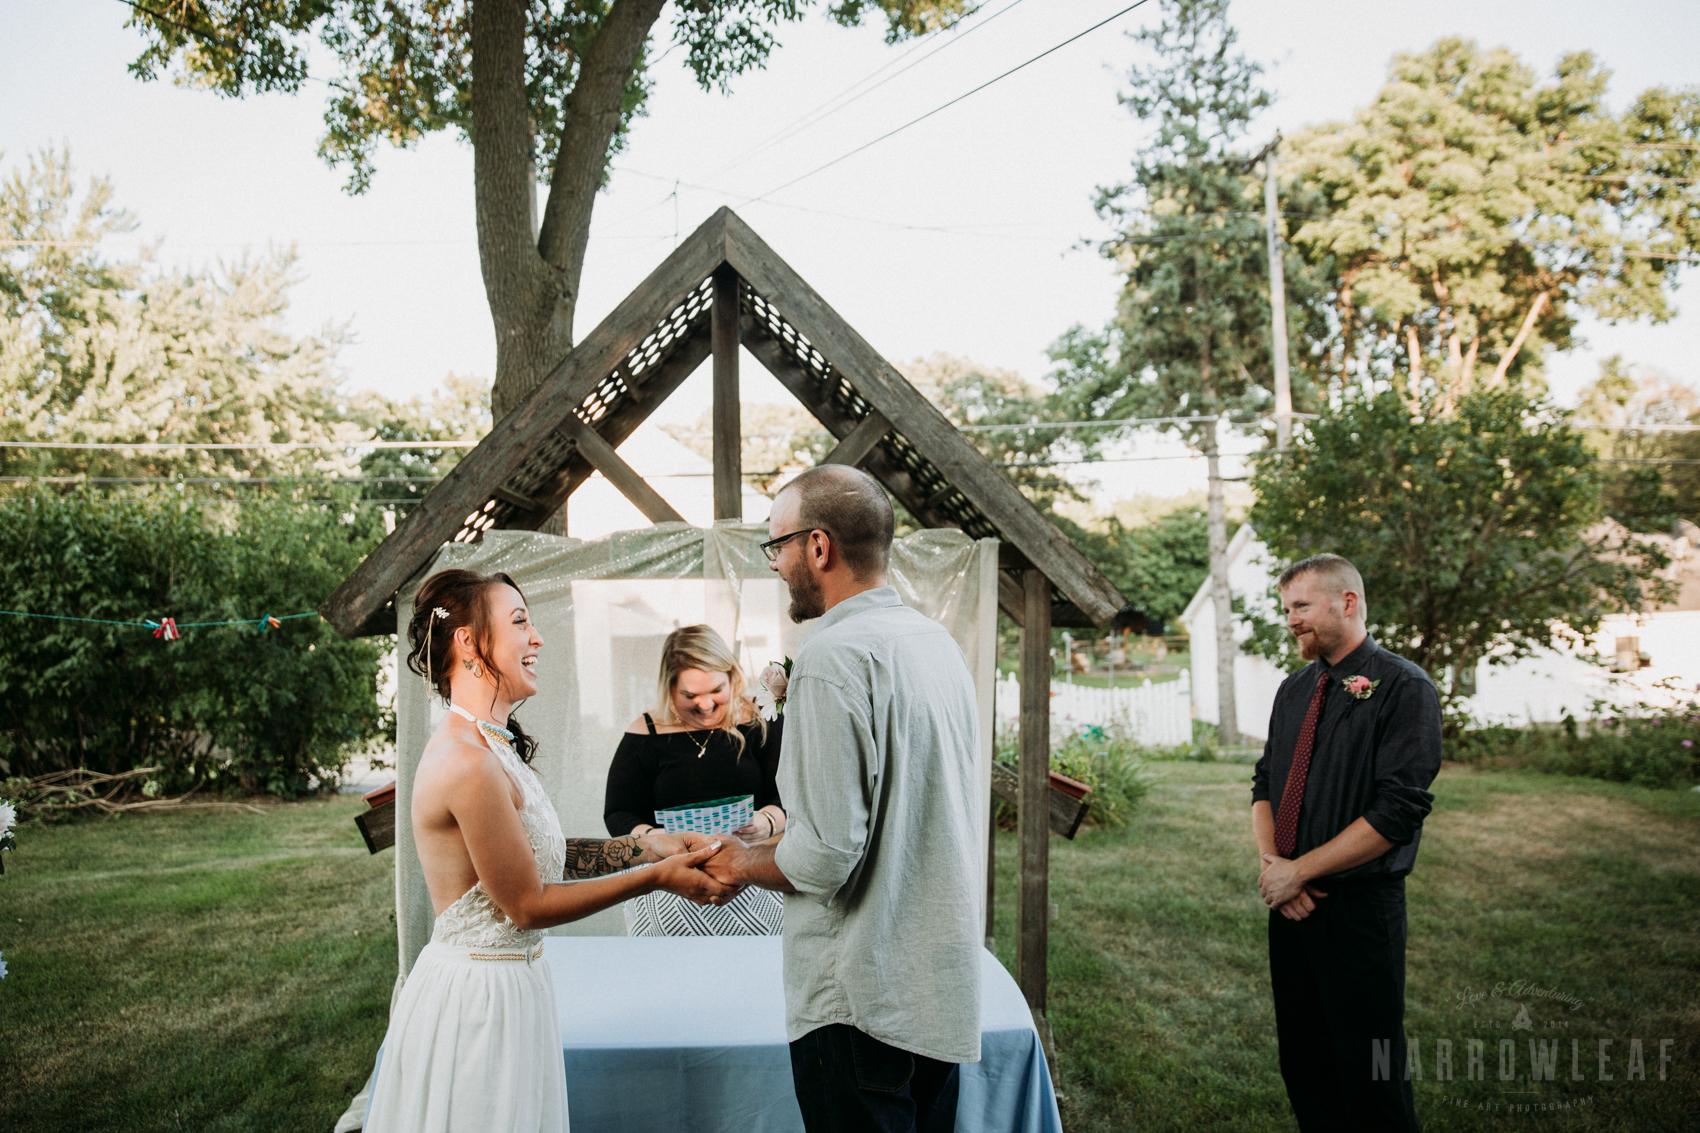 minnesota-outdoor-wedding-elopement-NarrowLeaf_Love_&_Adventure_Photography-14.jpg